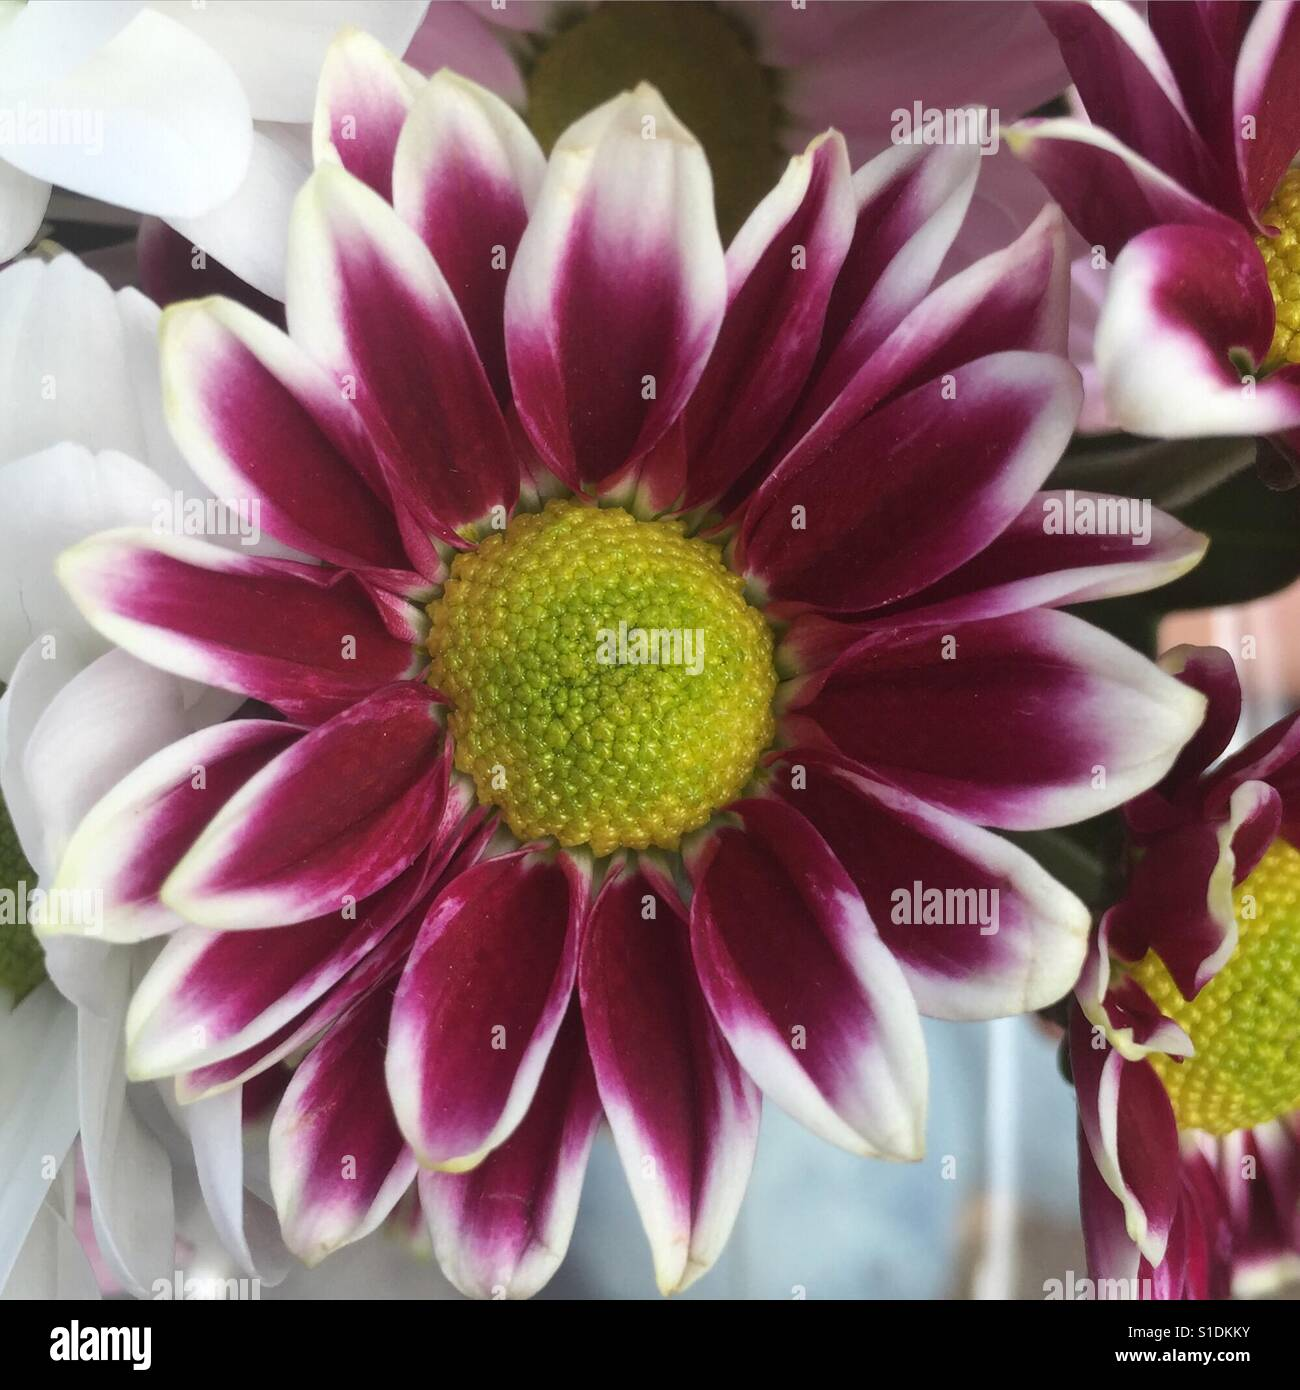 Beautiful single flower stock photo 310702111 alamy beautiful single flower izmirmasajfo